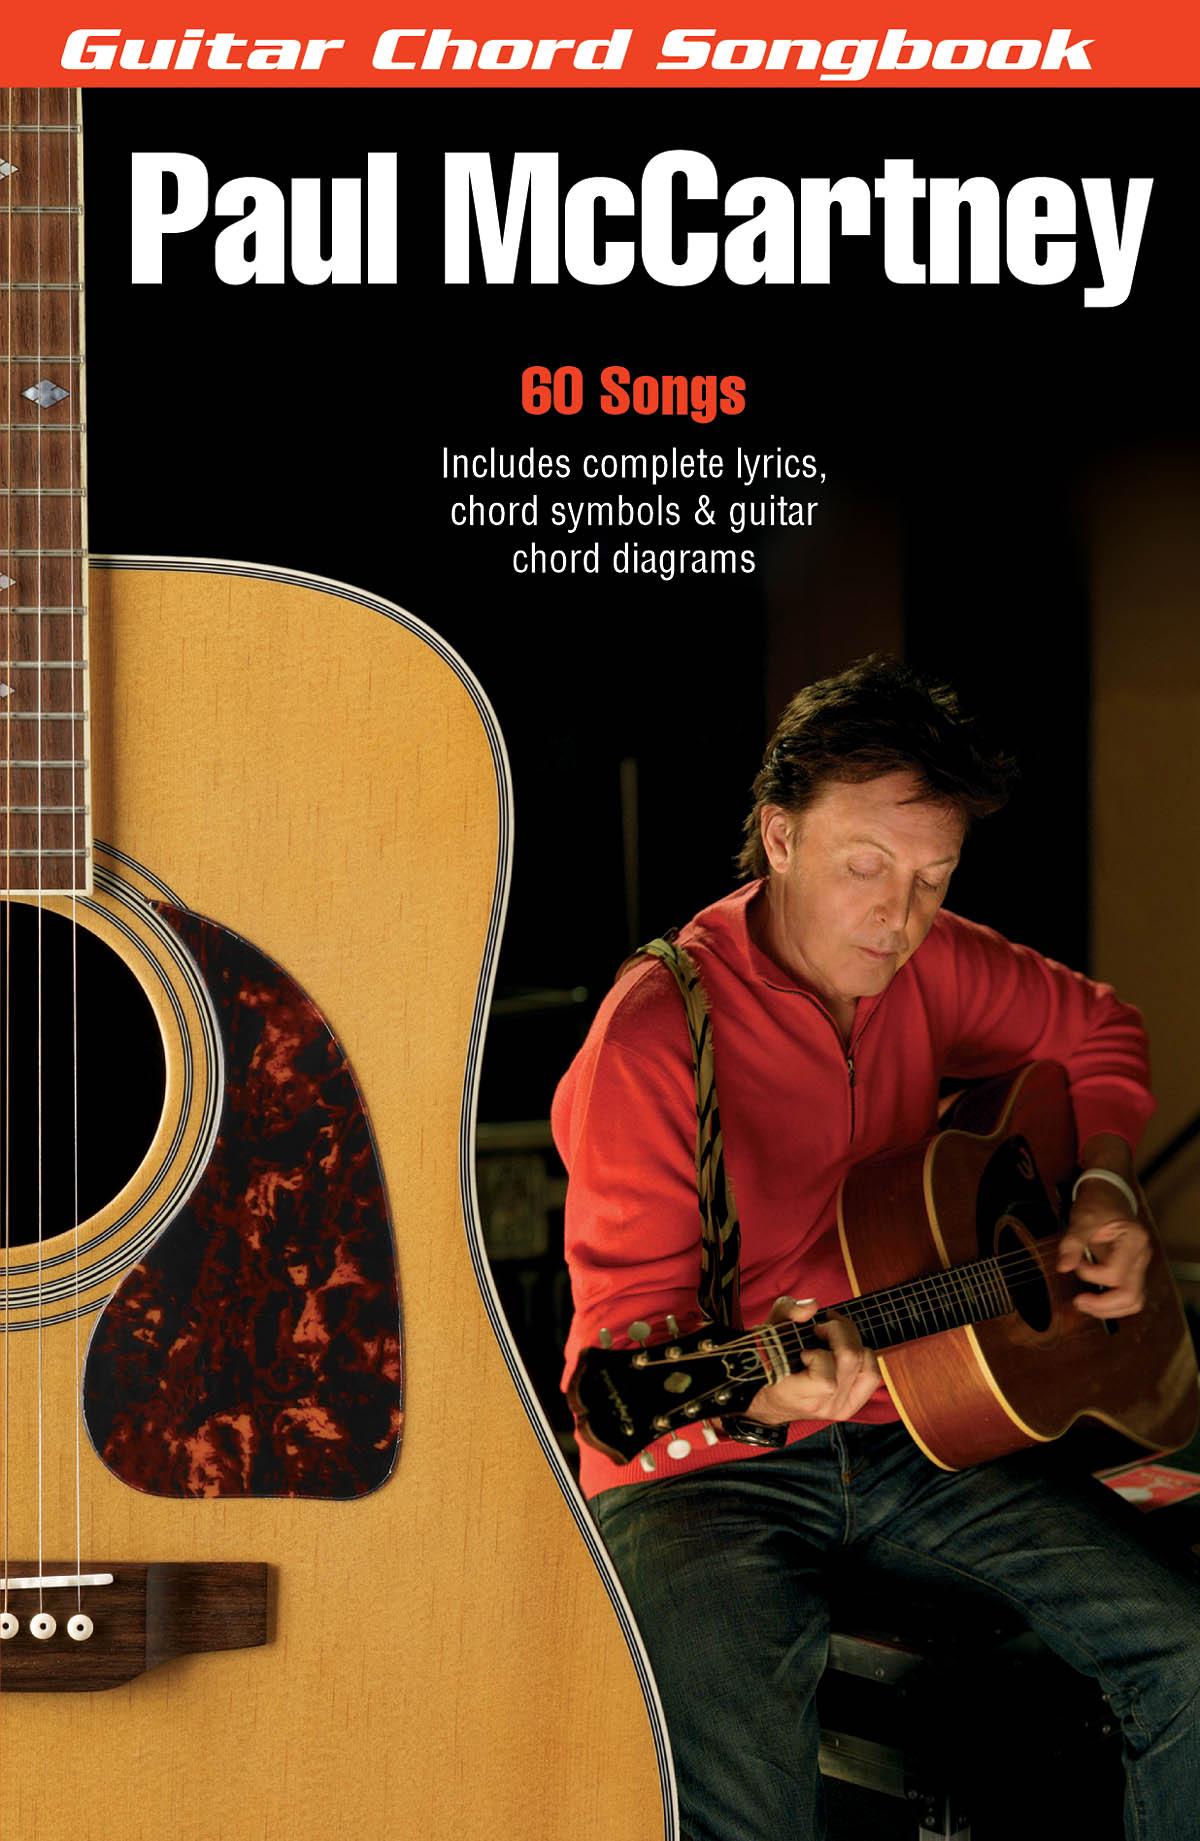 Paul McCartney: Paul McCartney: Vocal and Guitar: Artist Songbook